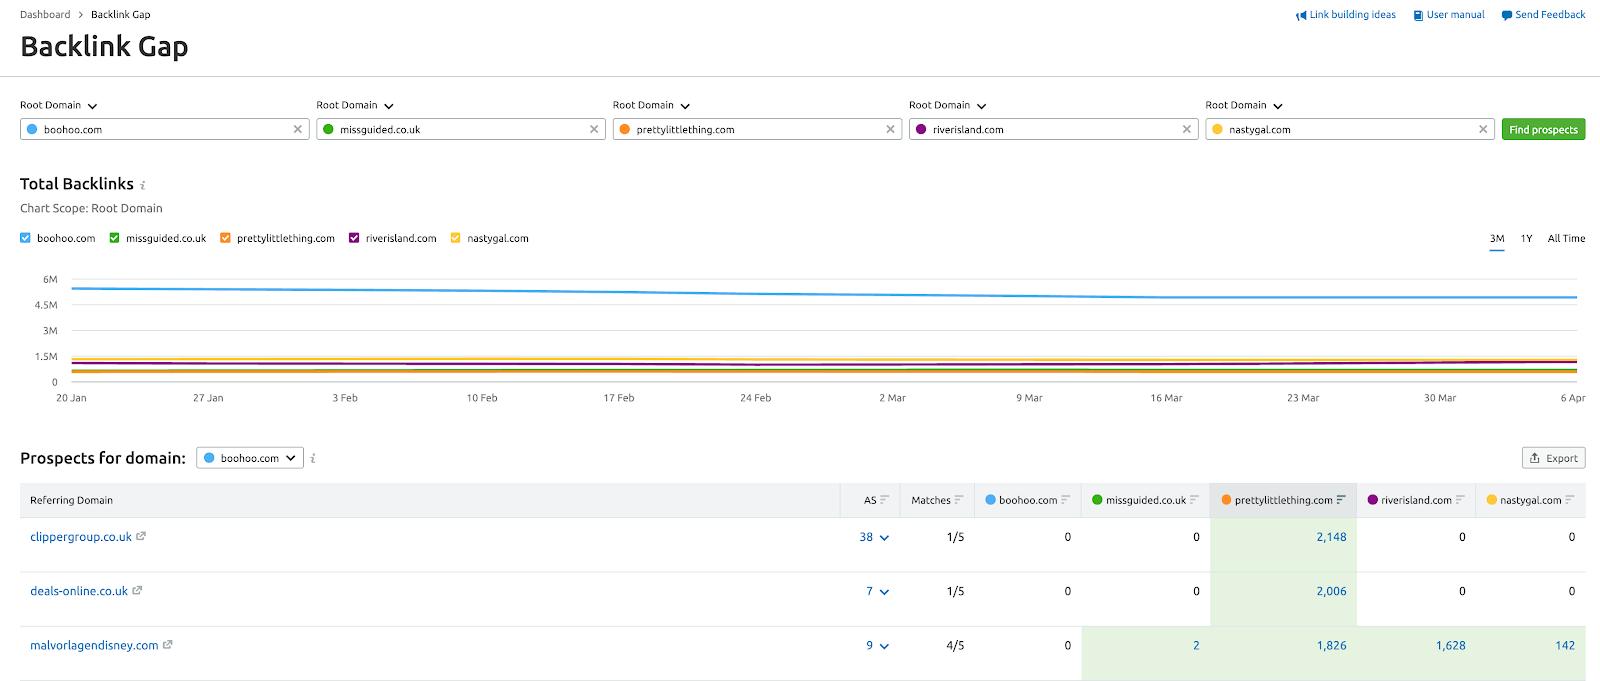 Backlink gap tool data example from SEMrush